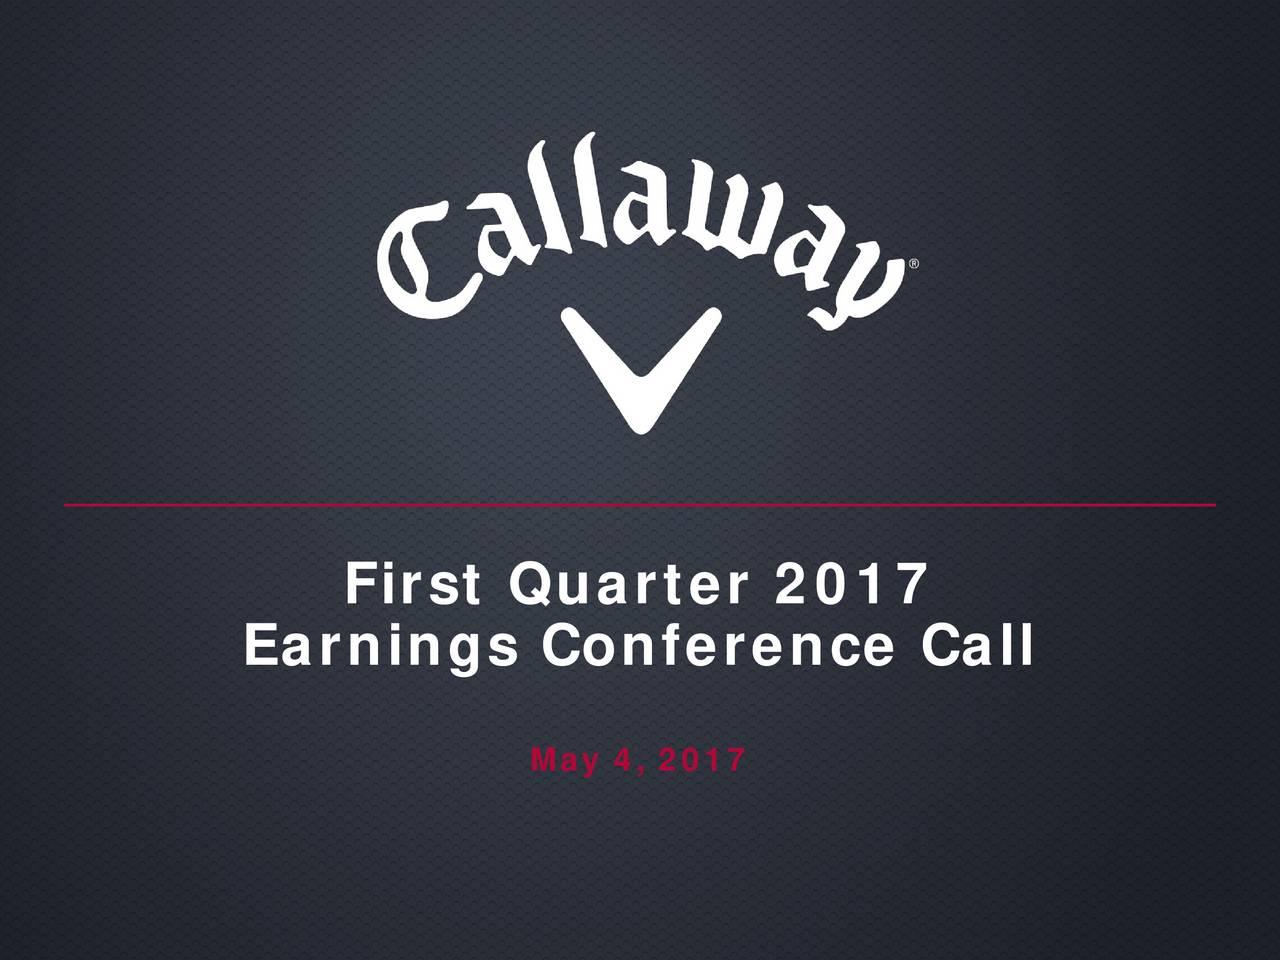 callaway marketing strategy